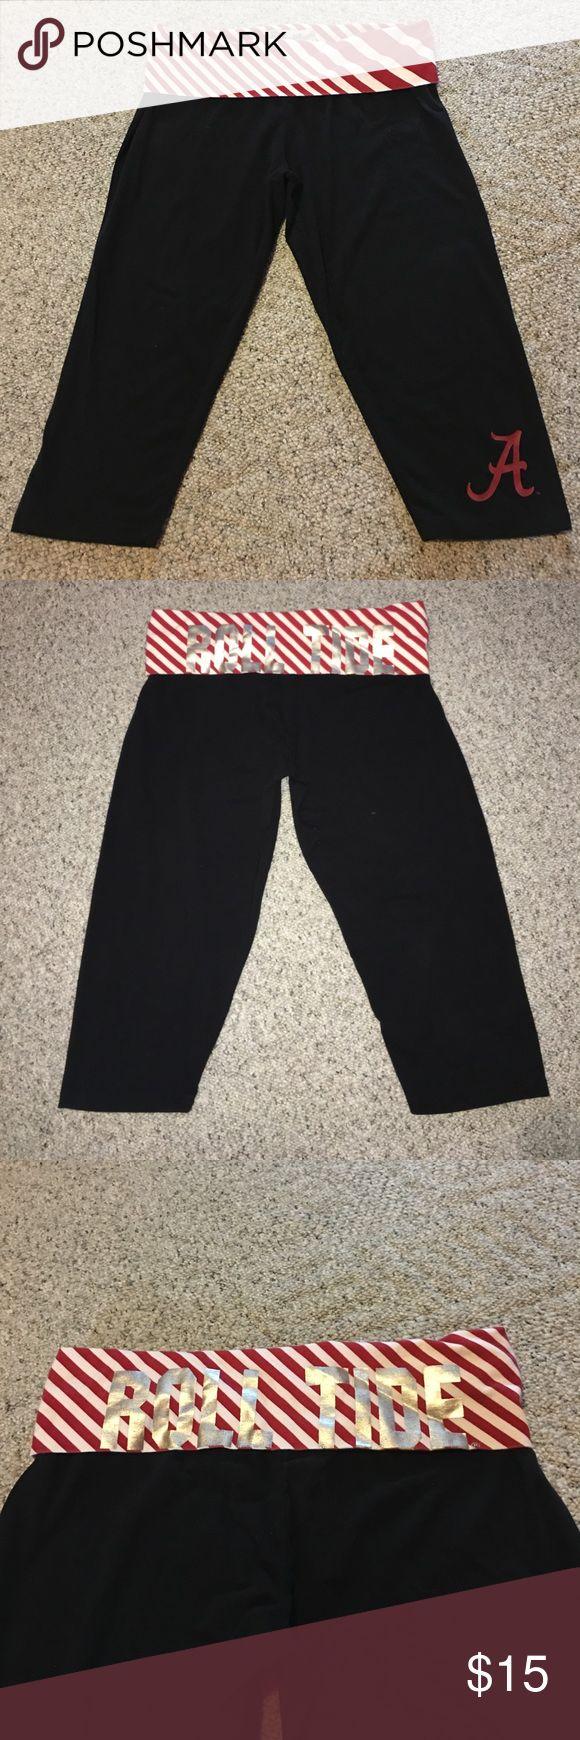 Spotted while shopping on Poshmark: ❤️Women's XL 🐘ROLL TIDE🐘 Capri Leggings❤️! #poshmark #fashion #shopping #style #E5 College Classics #Pants